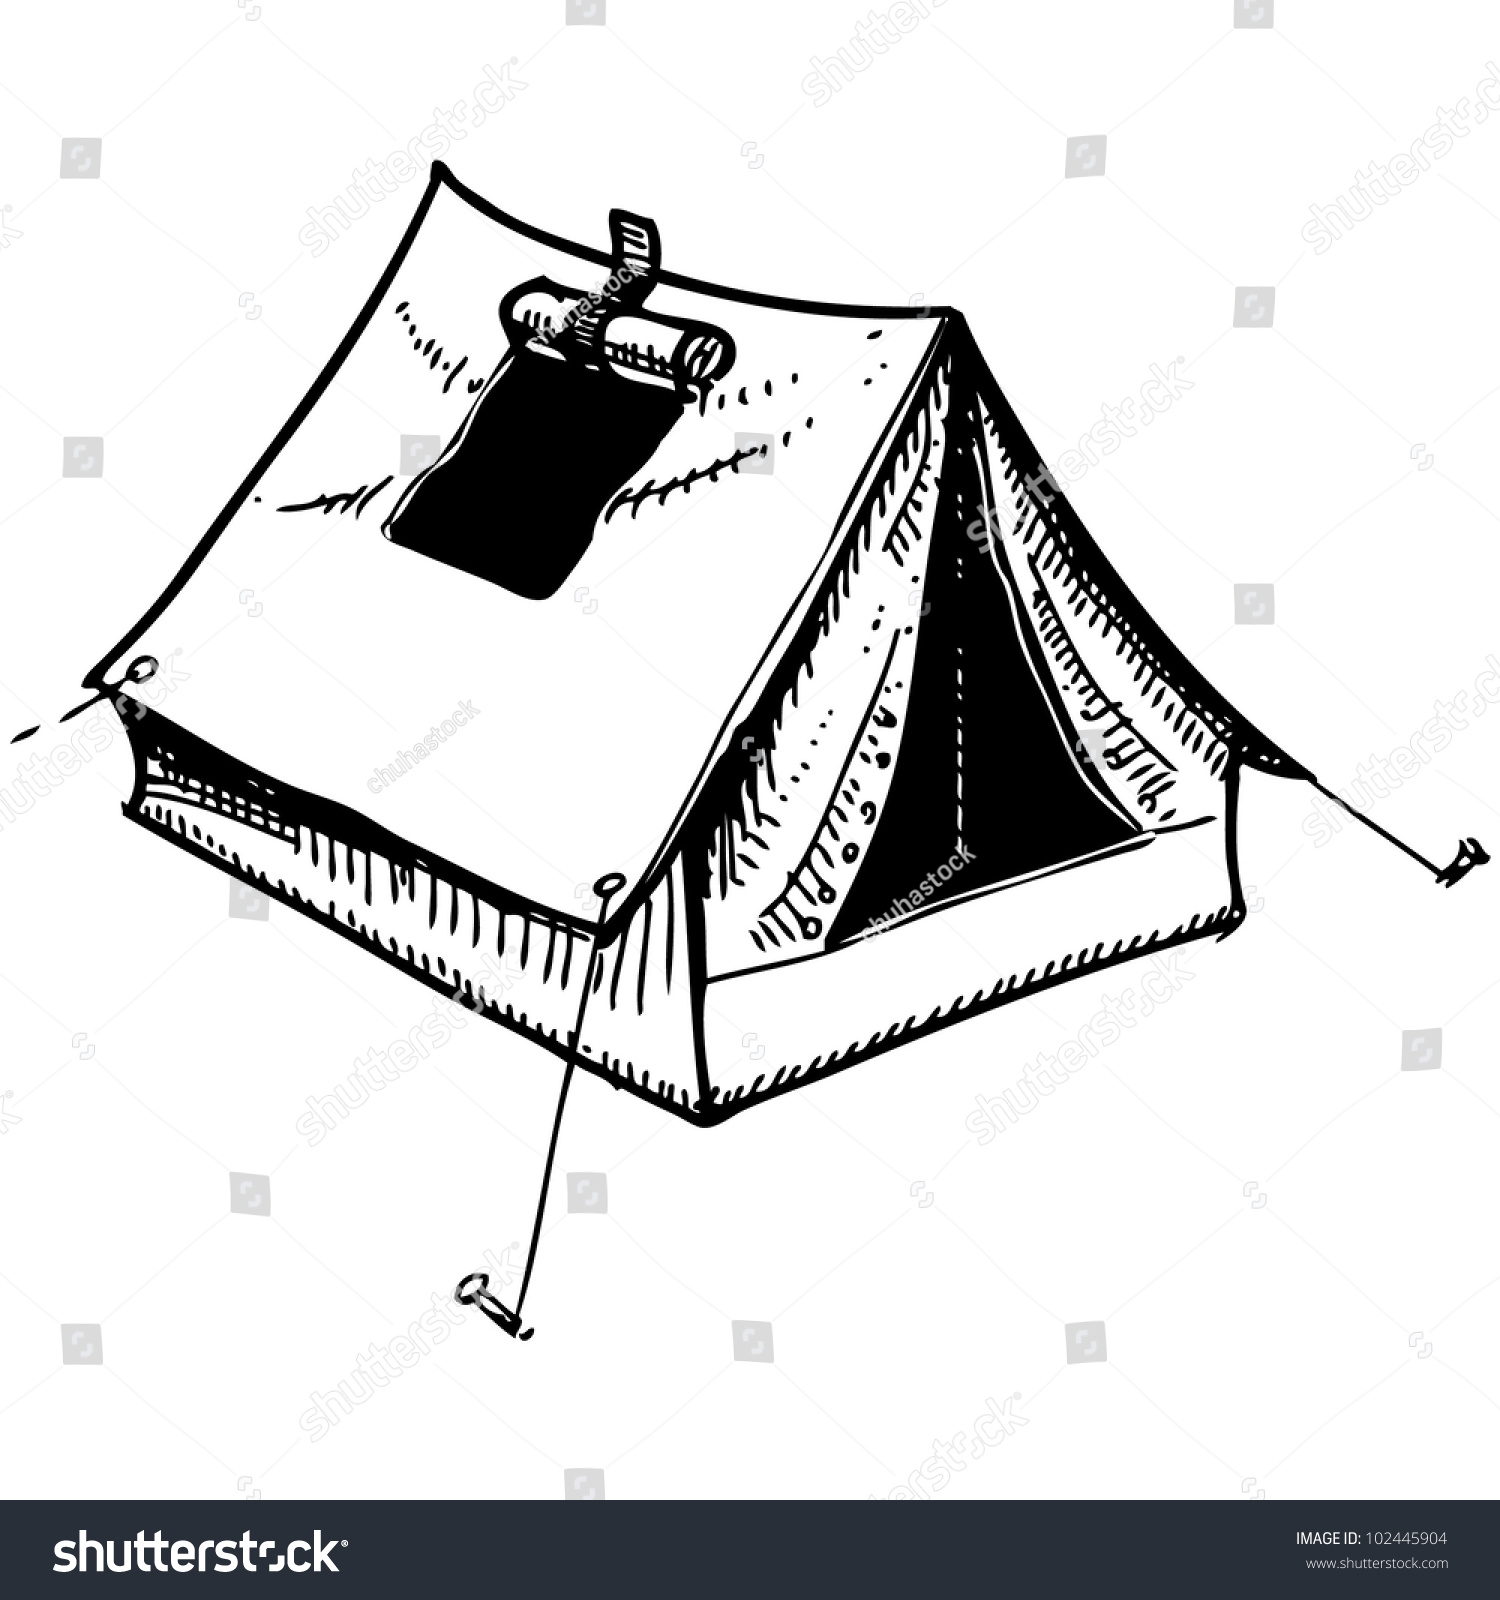 Camping Tent Drawing